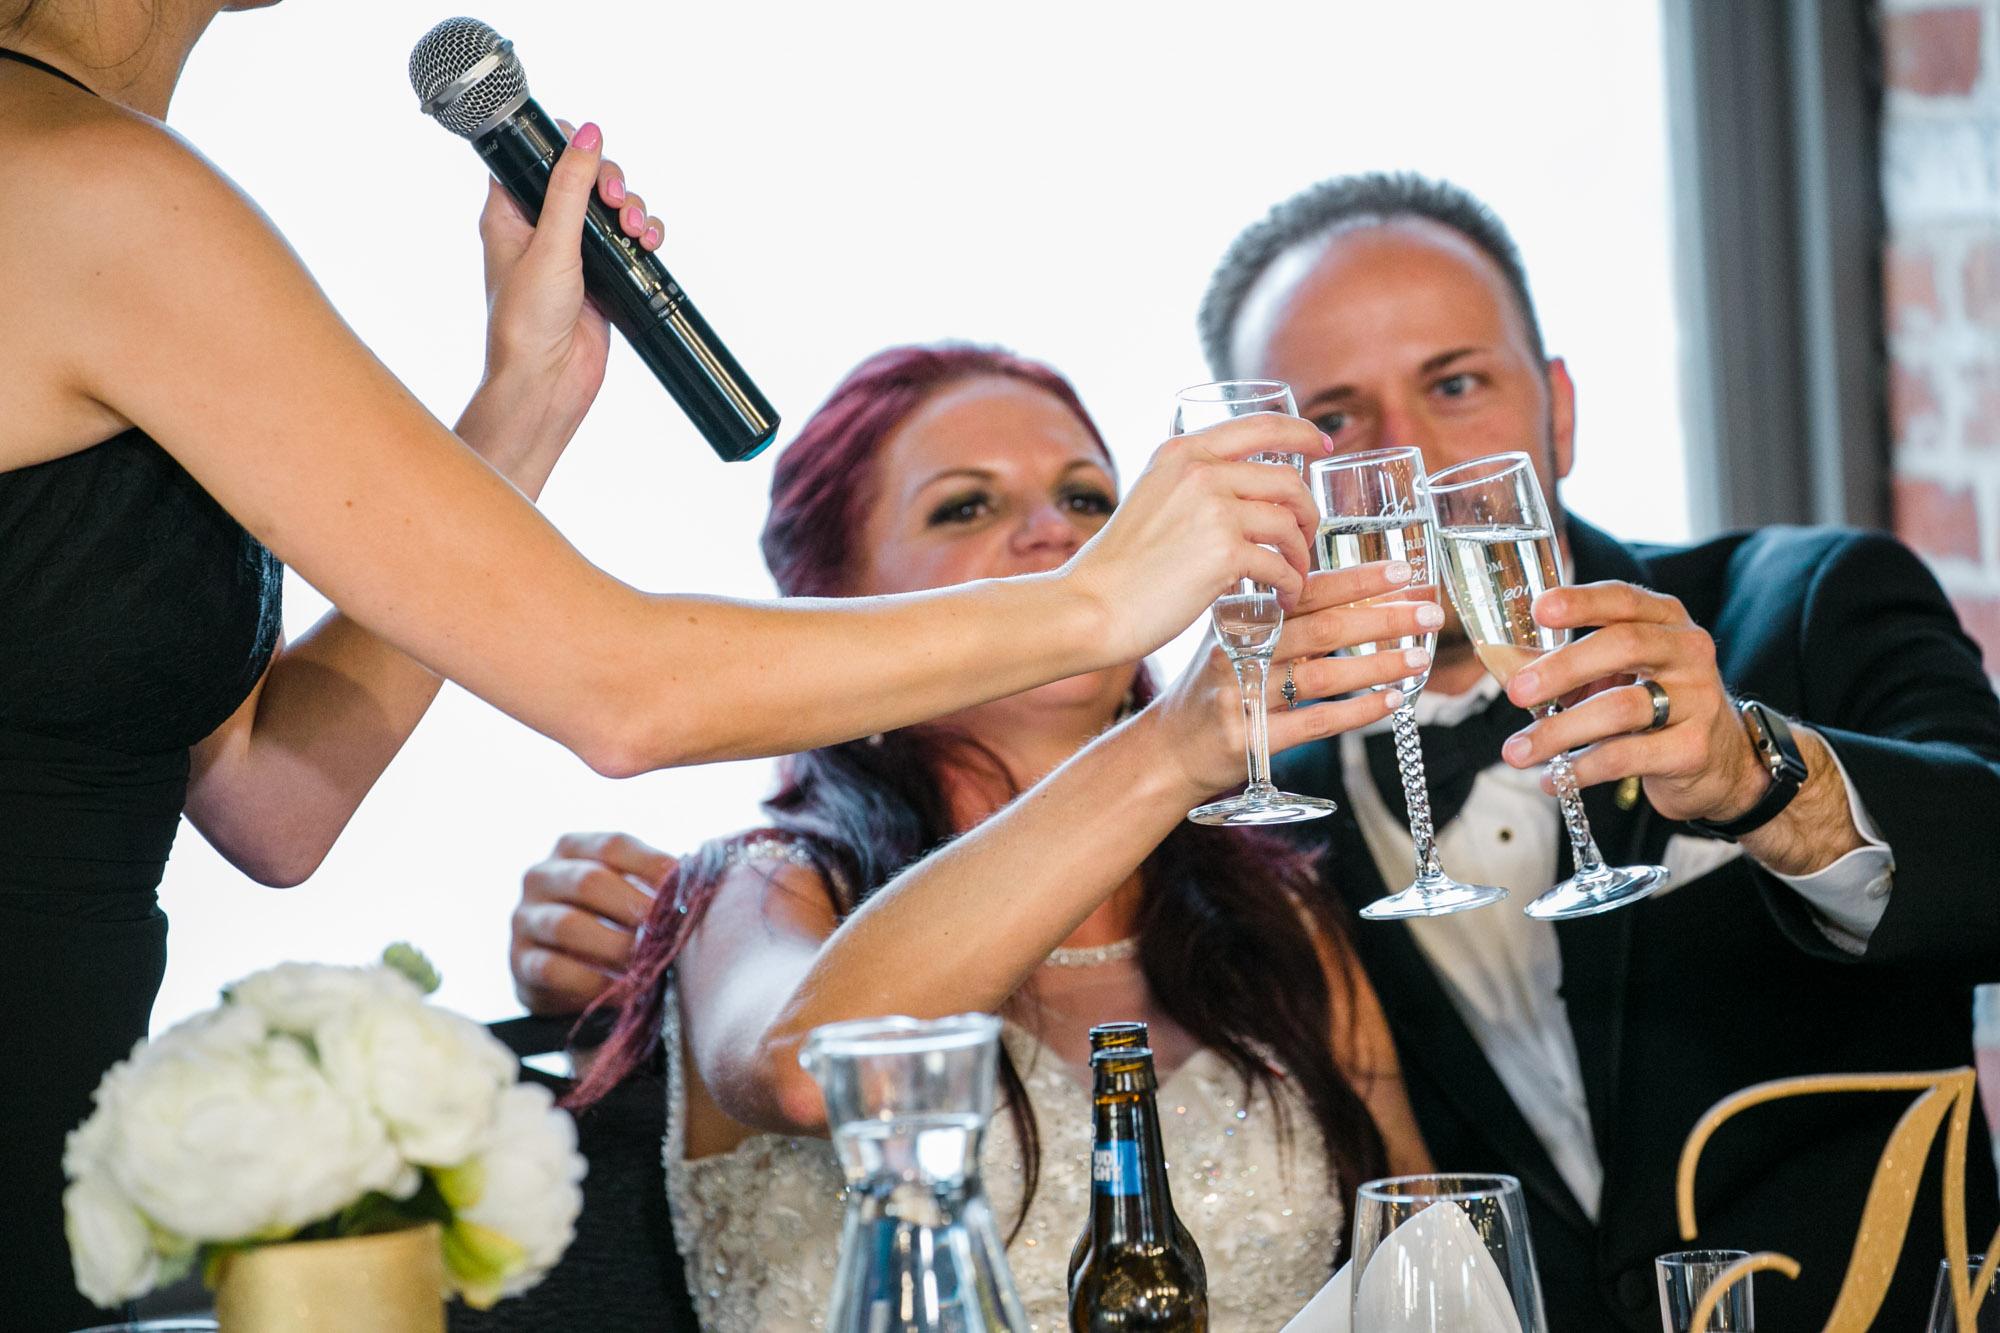 hensville-wedding-downtown-toledo-ohio (95 of 103).jpg